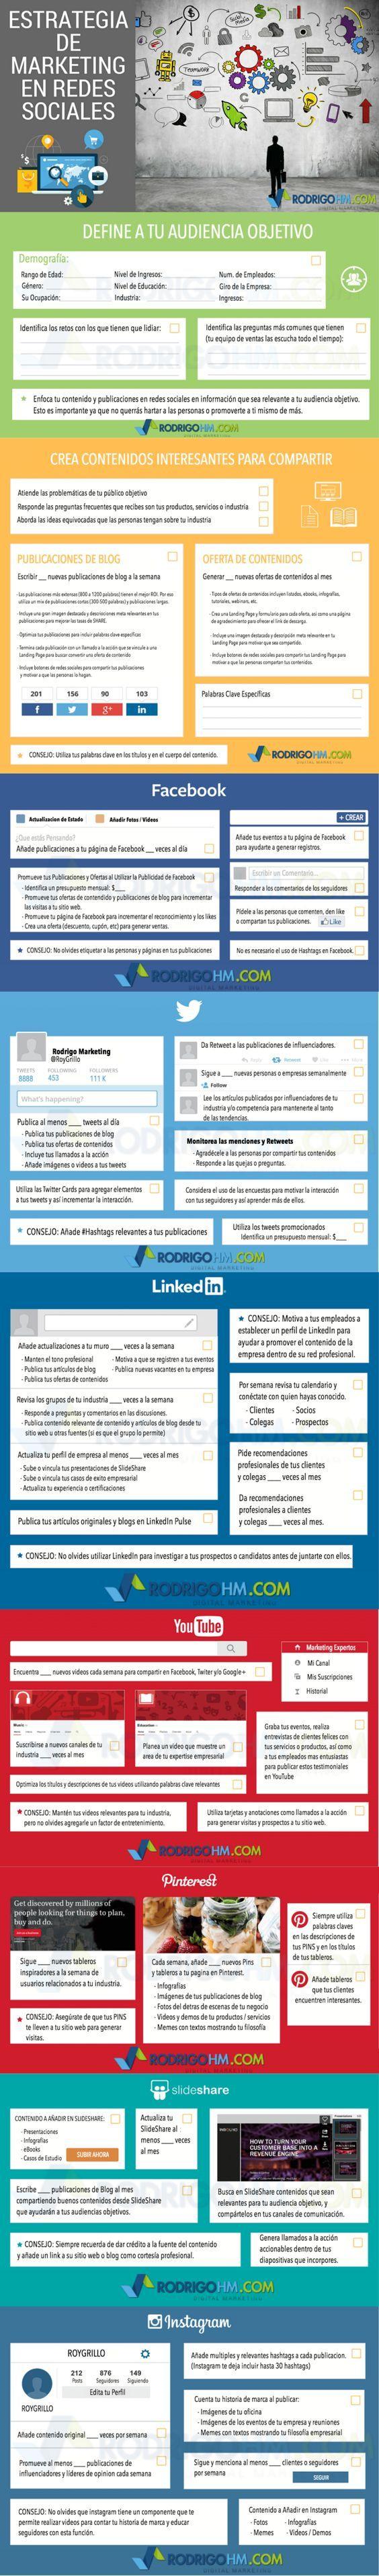 Estrategias de Marketing en Redes Sociales #infografia